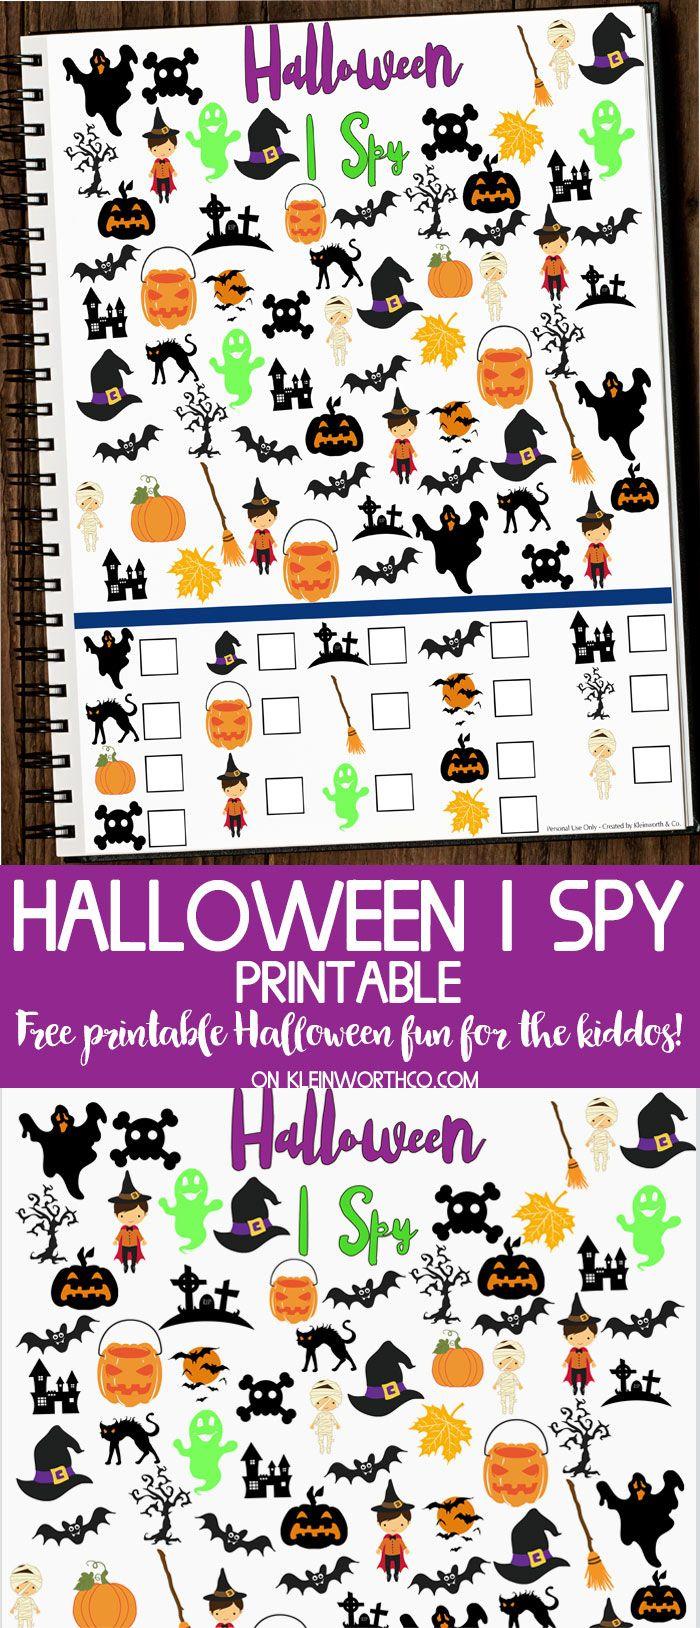 Free Halloween I Spy Printable - Fun Printable To Get The